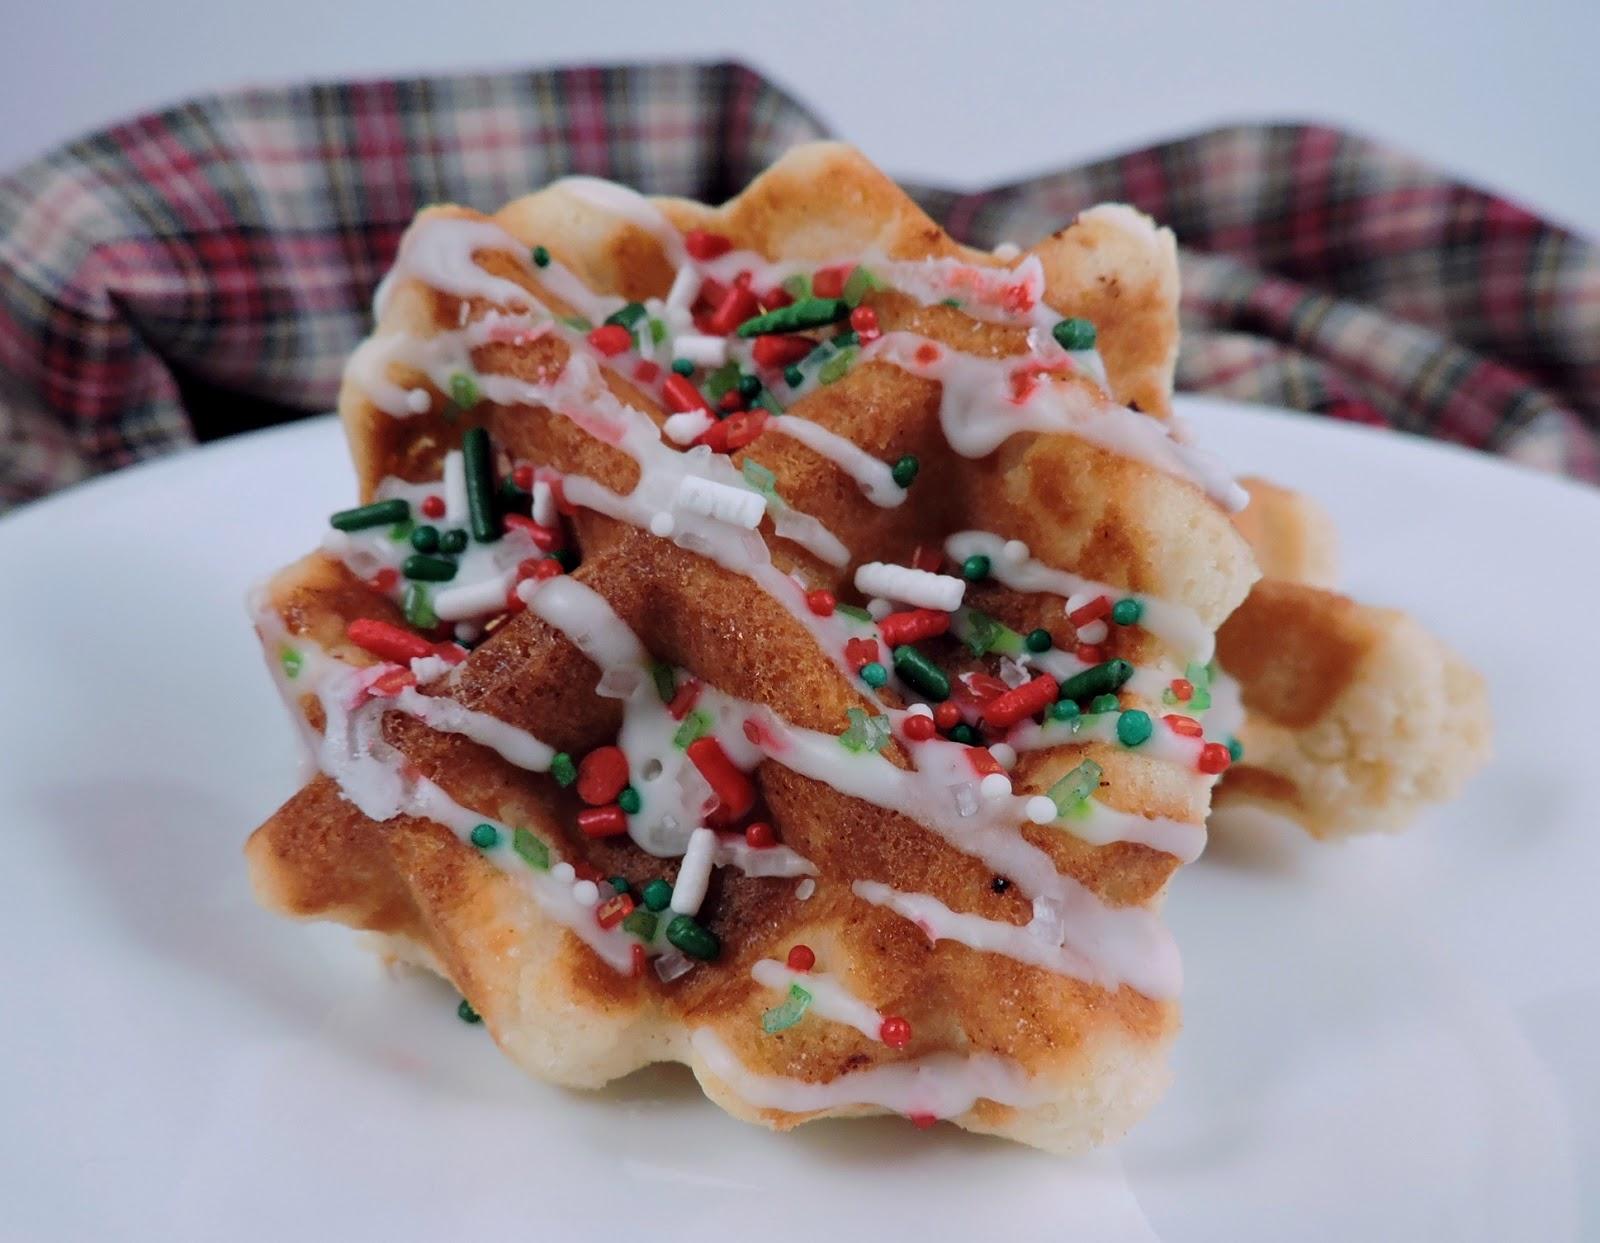 Waffle Iron Cookies